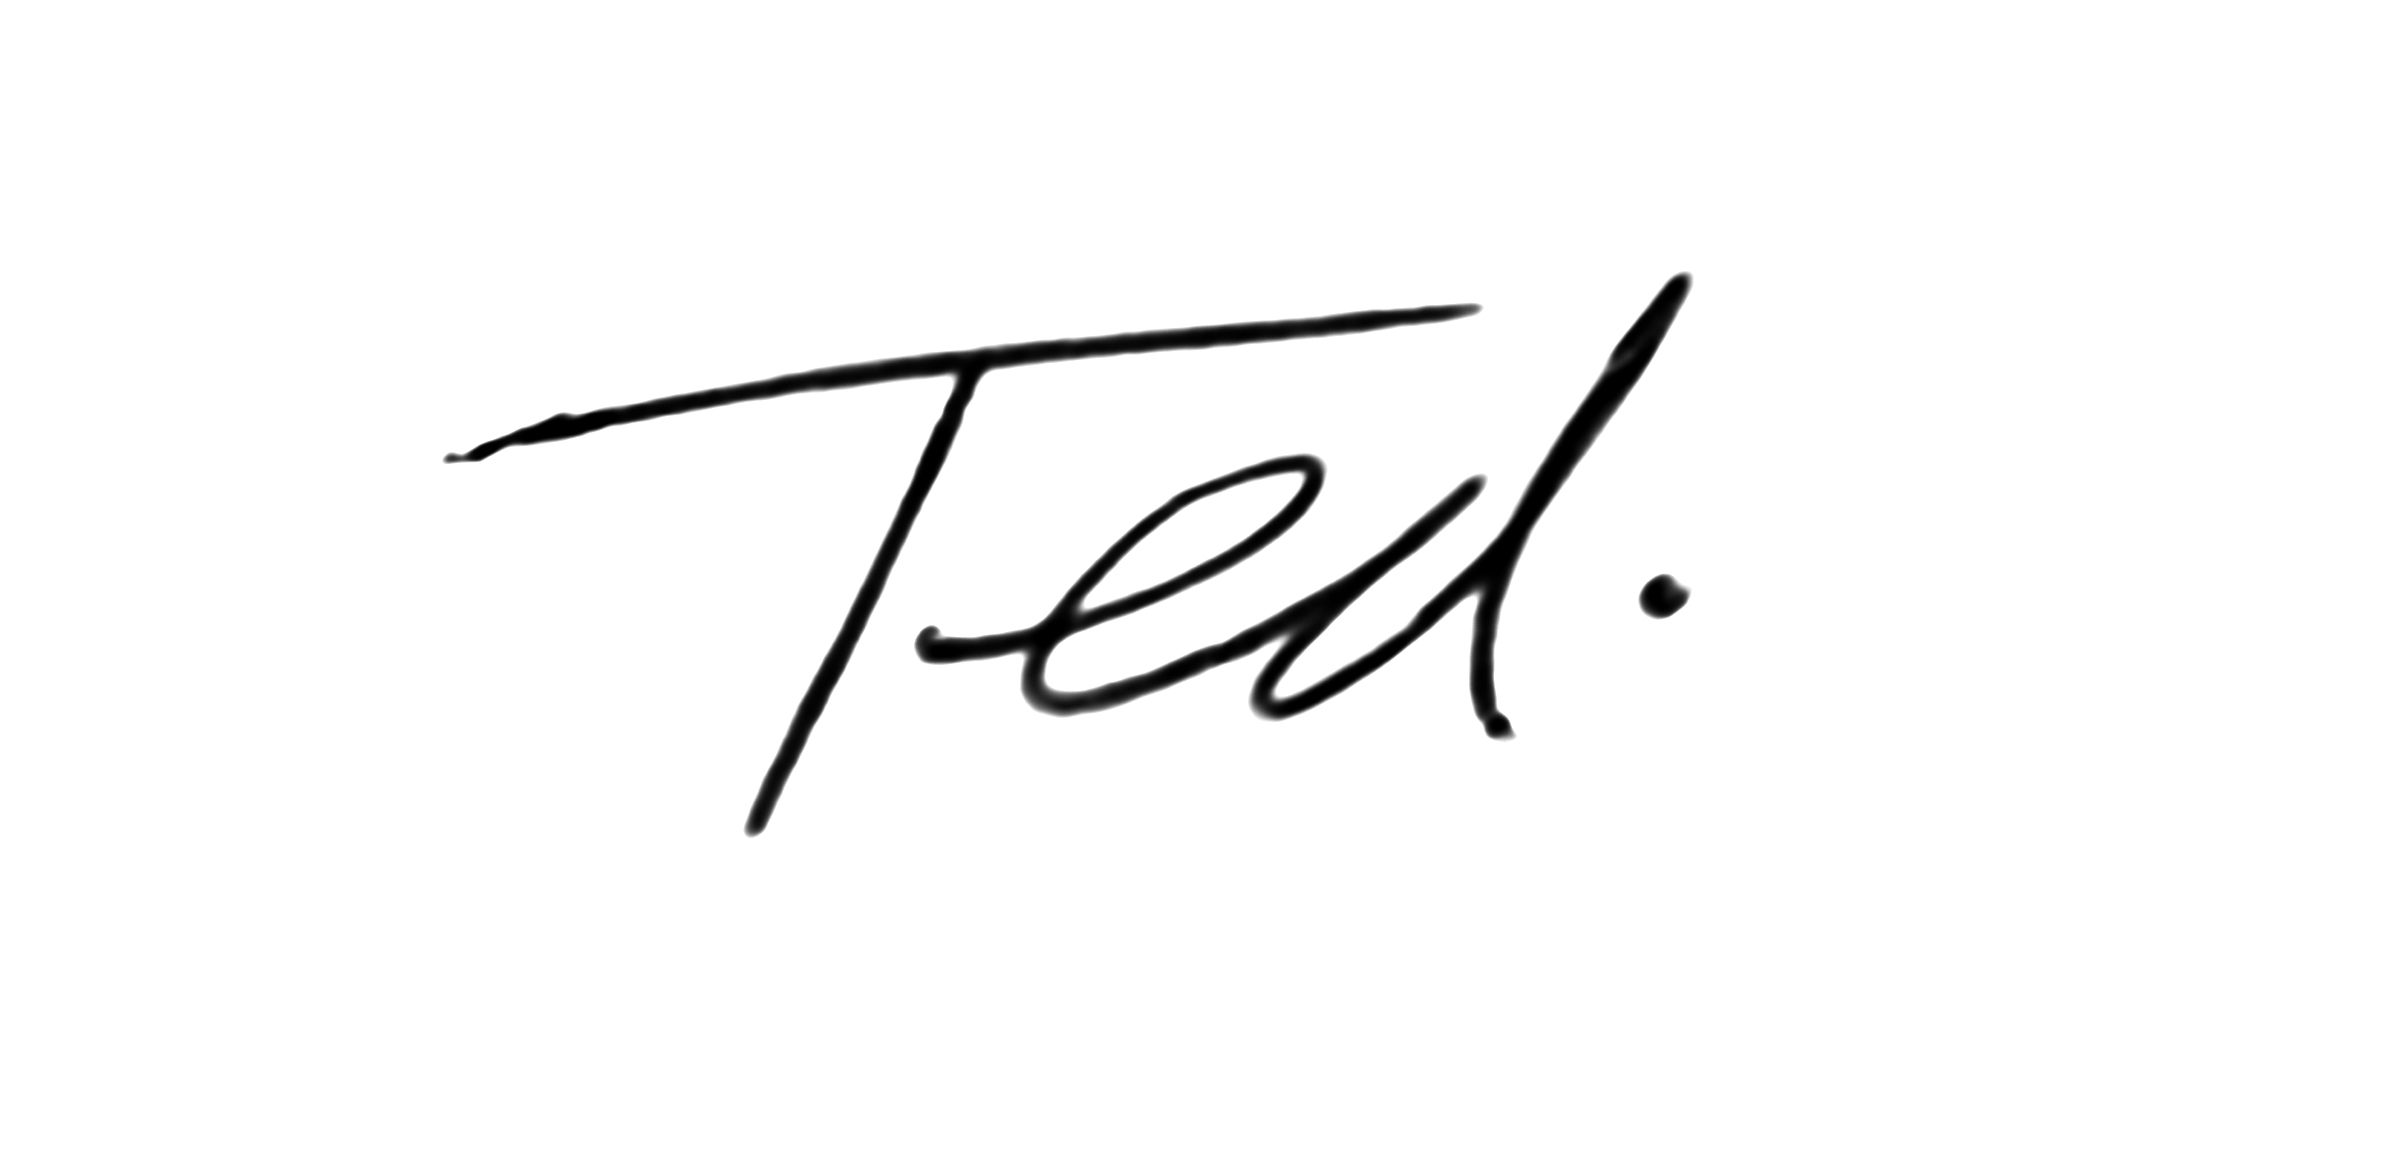 edward Larson's Signature